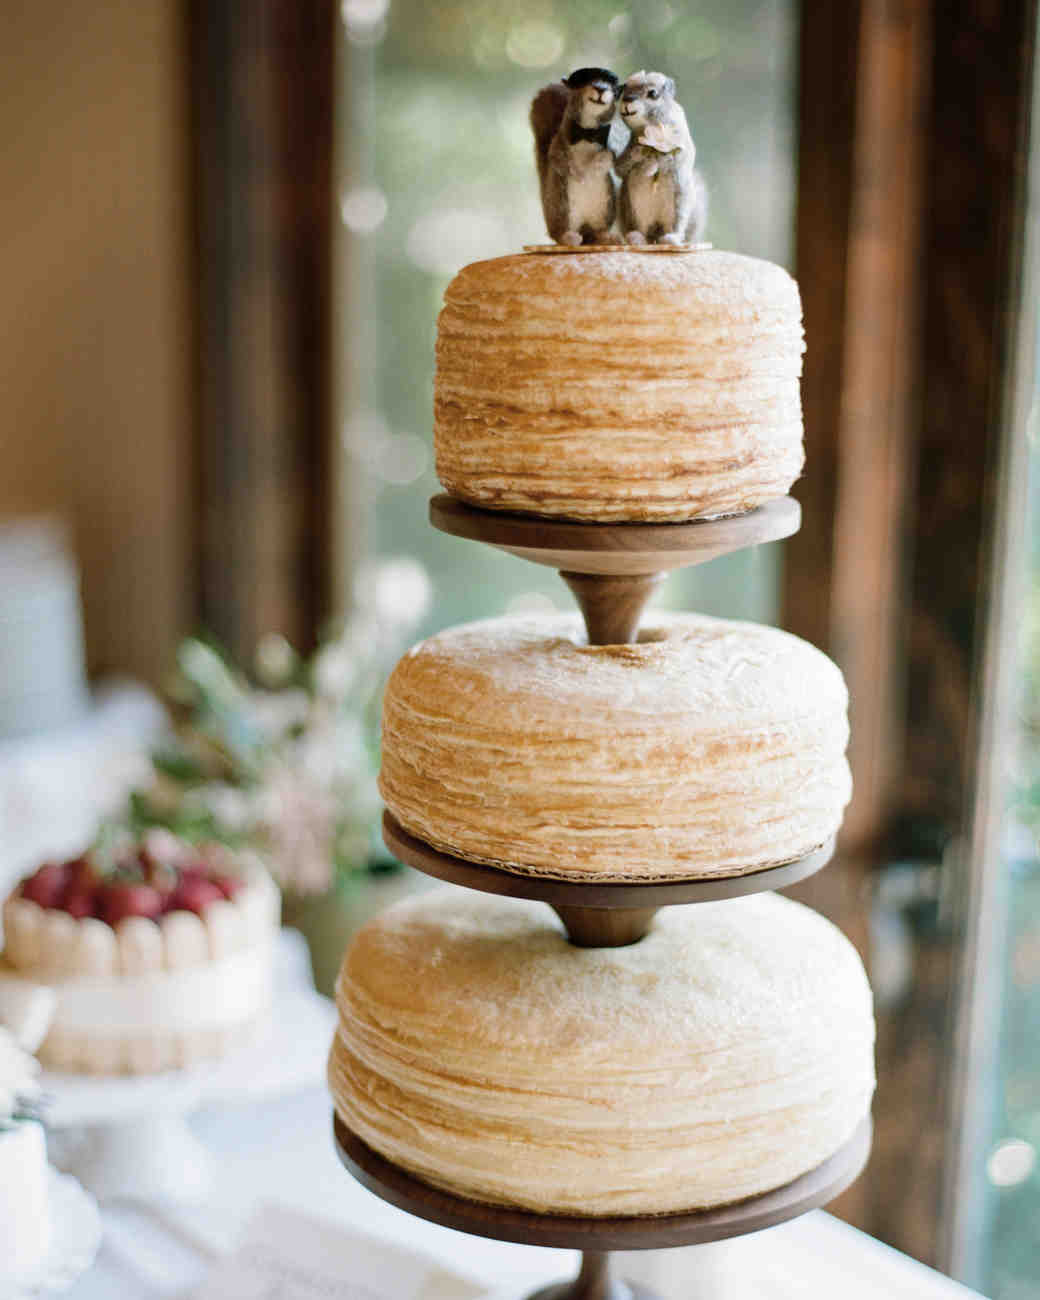 catherine-adrien-wedding-cake-0716-s111414-0814.jpg